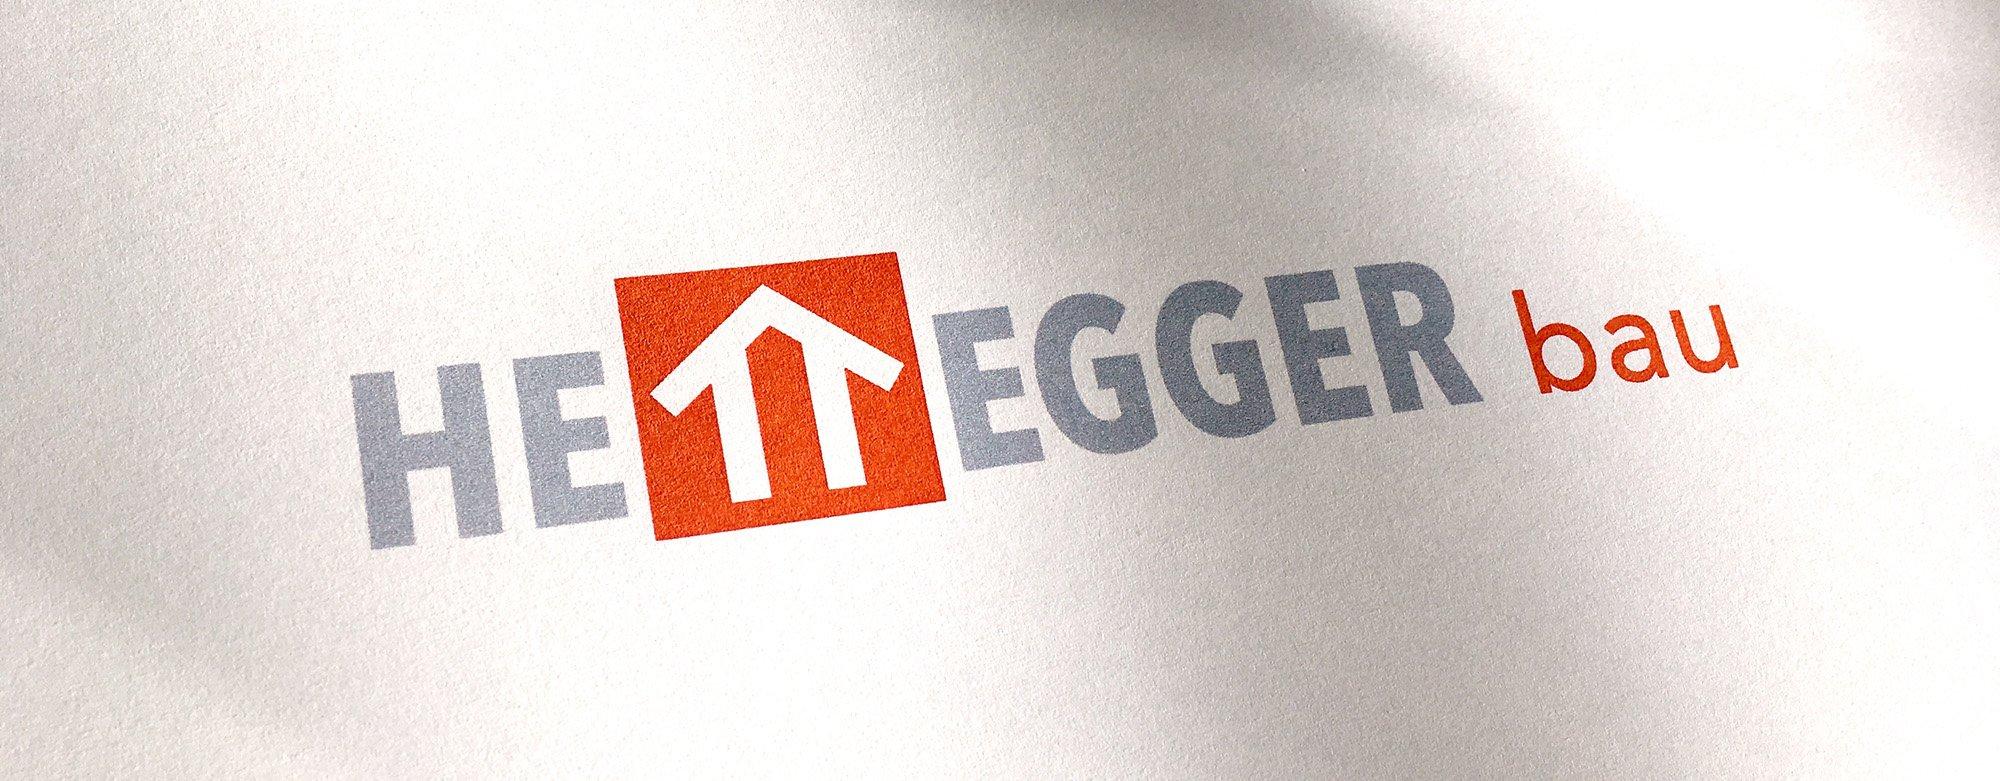 HetteggerBau-logo